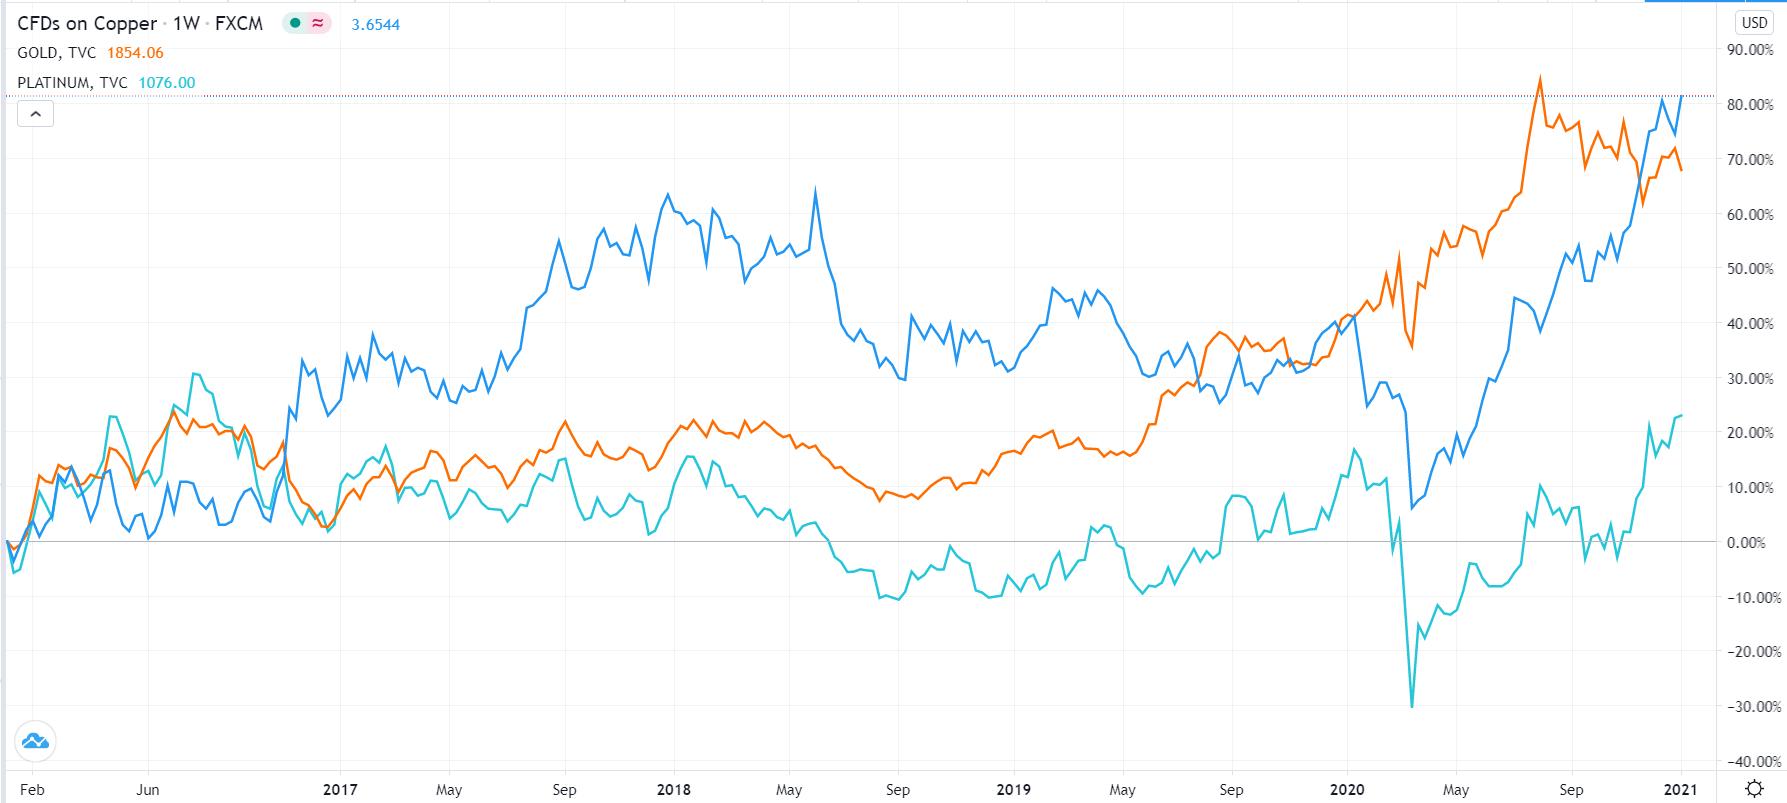 Copper vs. Gold and Platinum